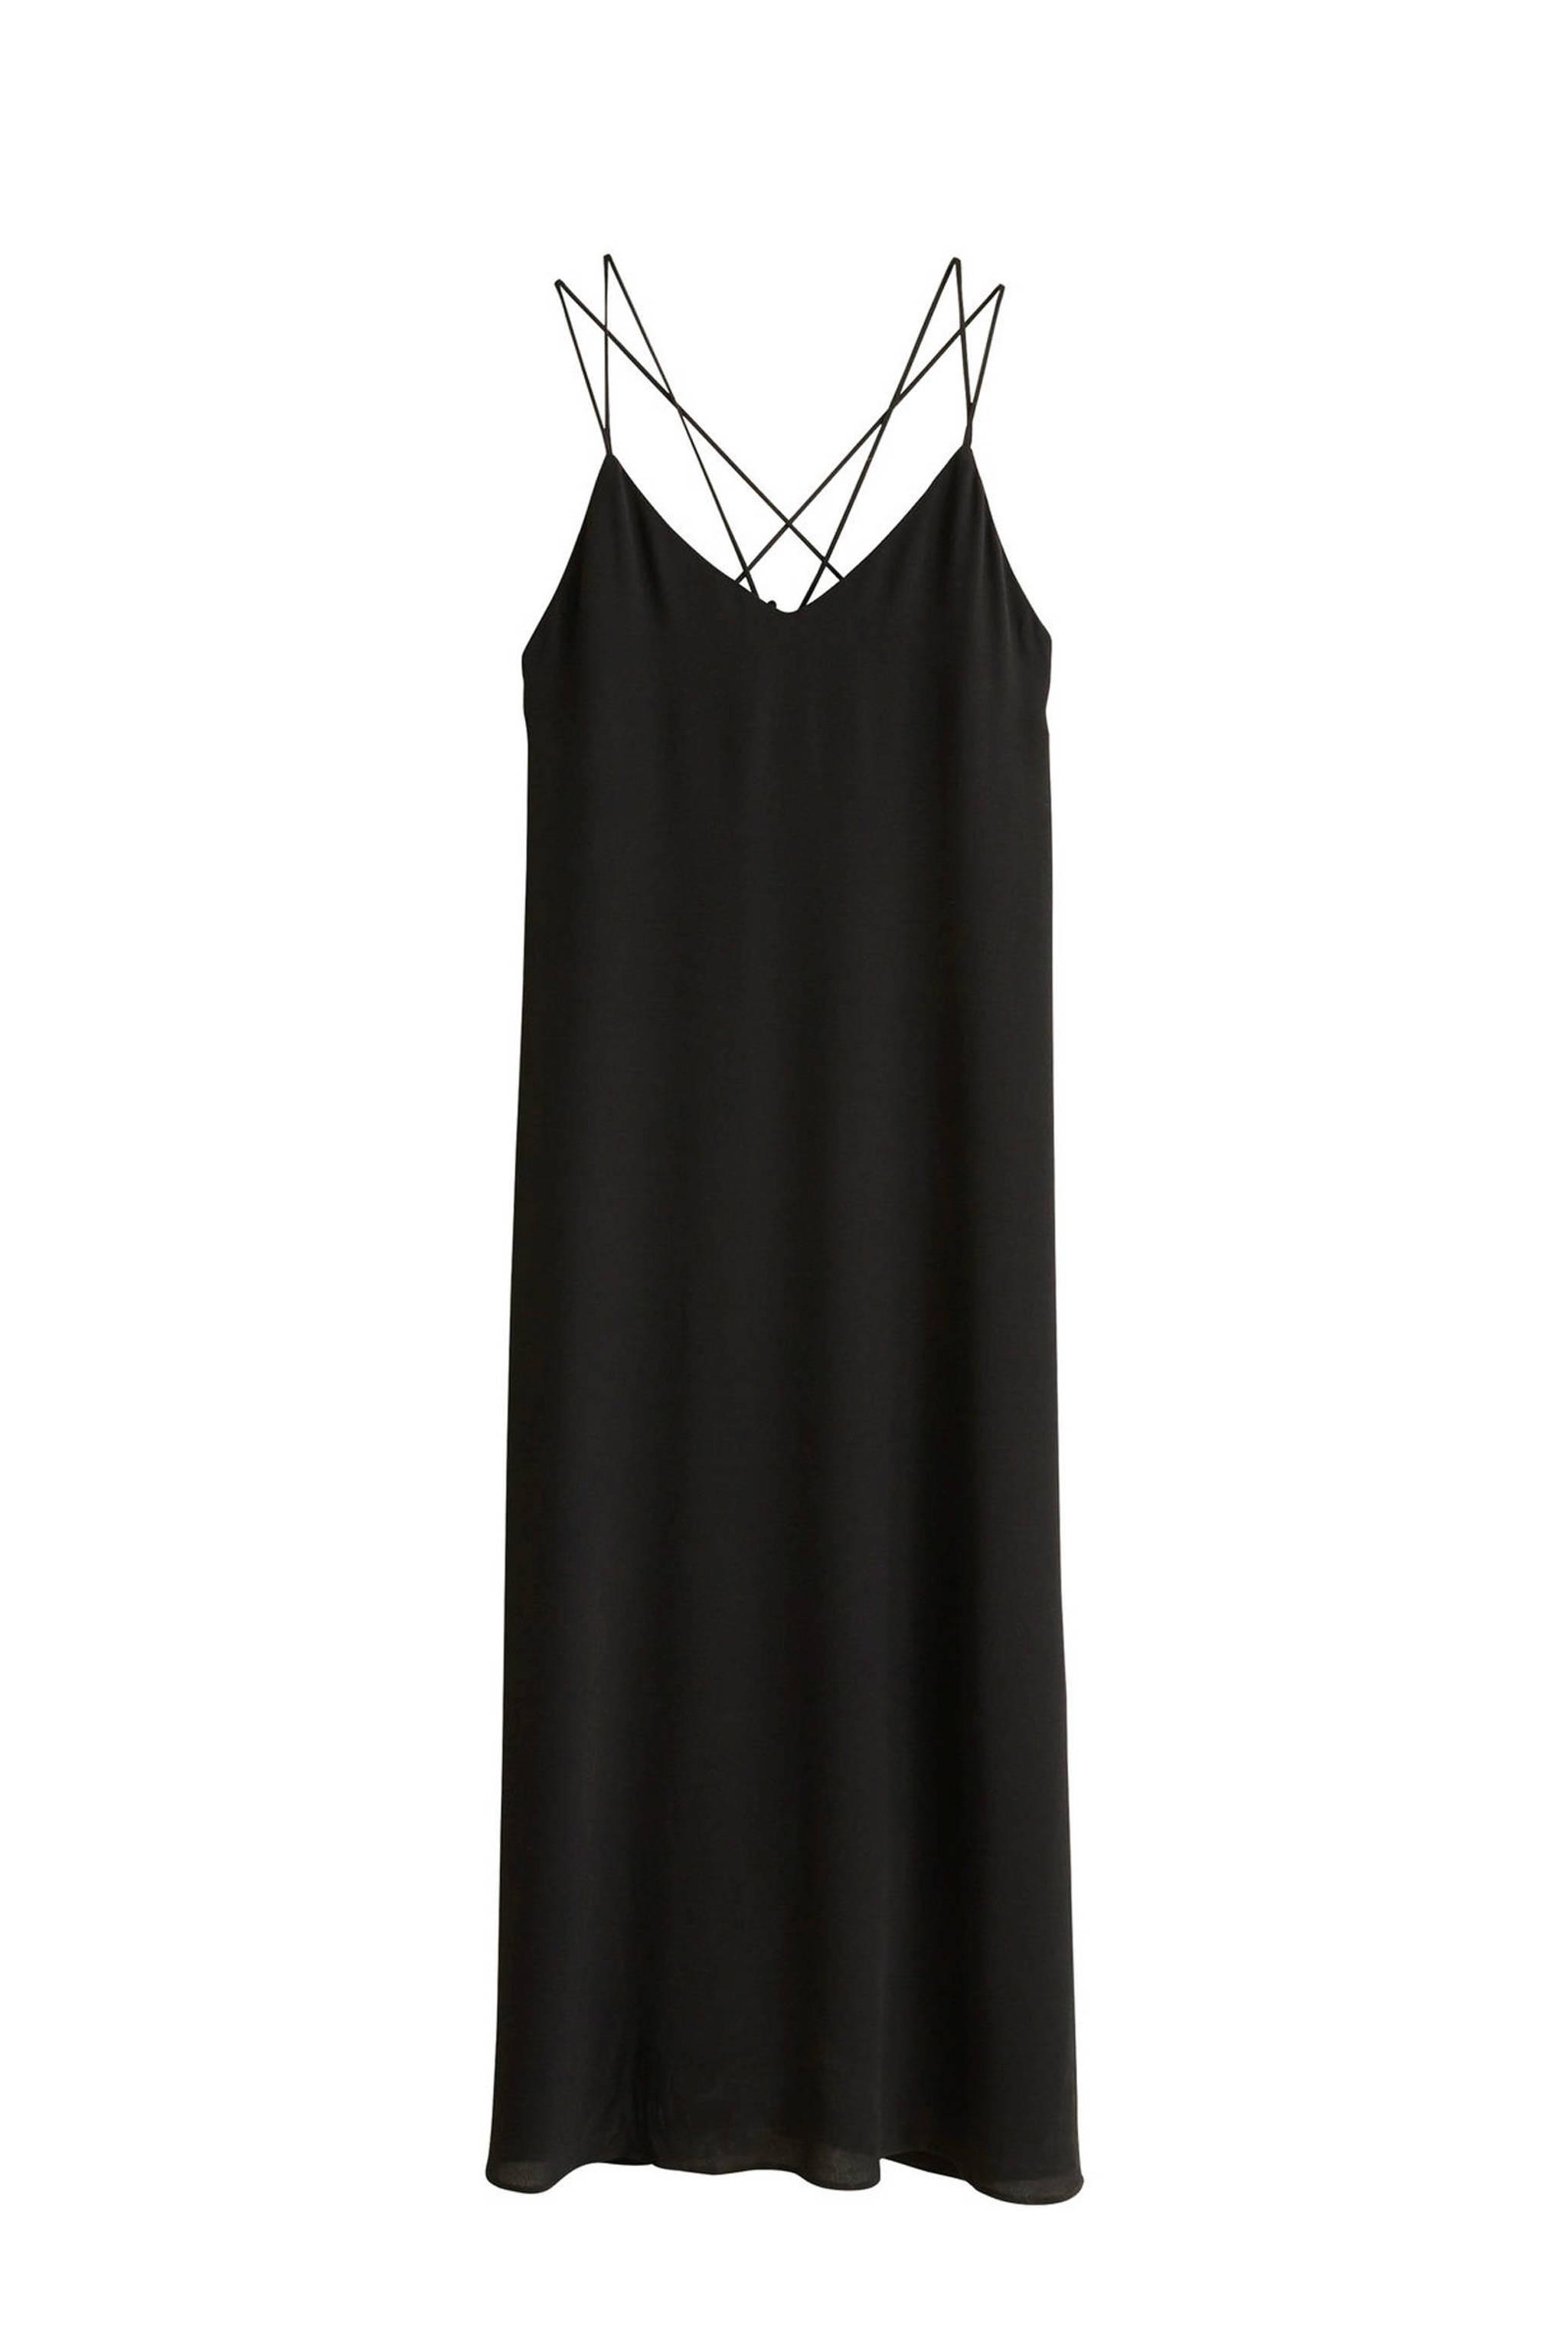 e240ac7bbba0d3 Mango jurk met dubbele spaghettibandjes zwart